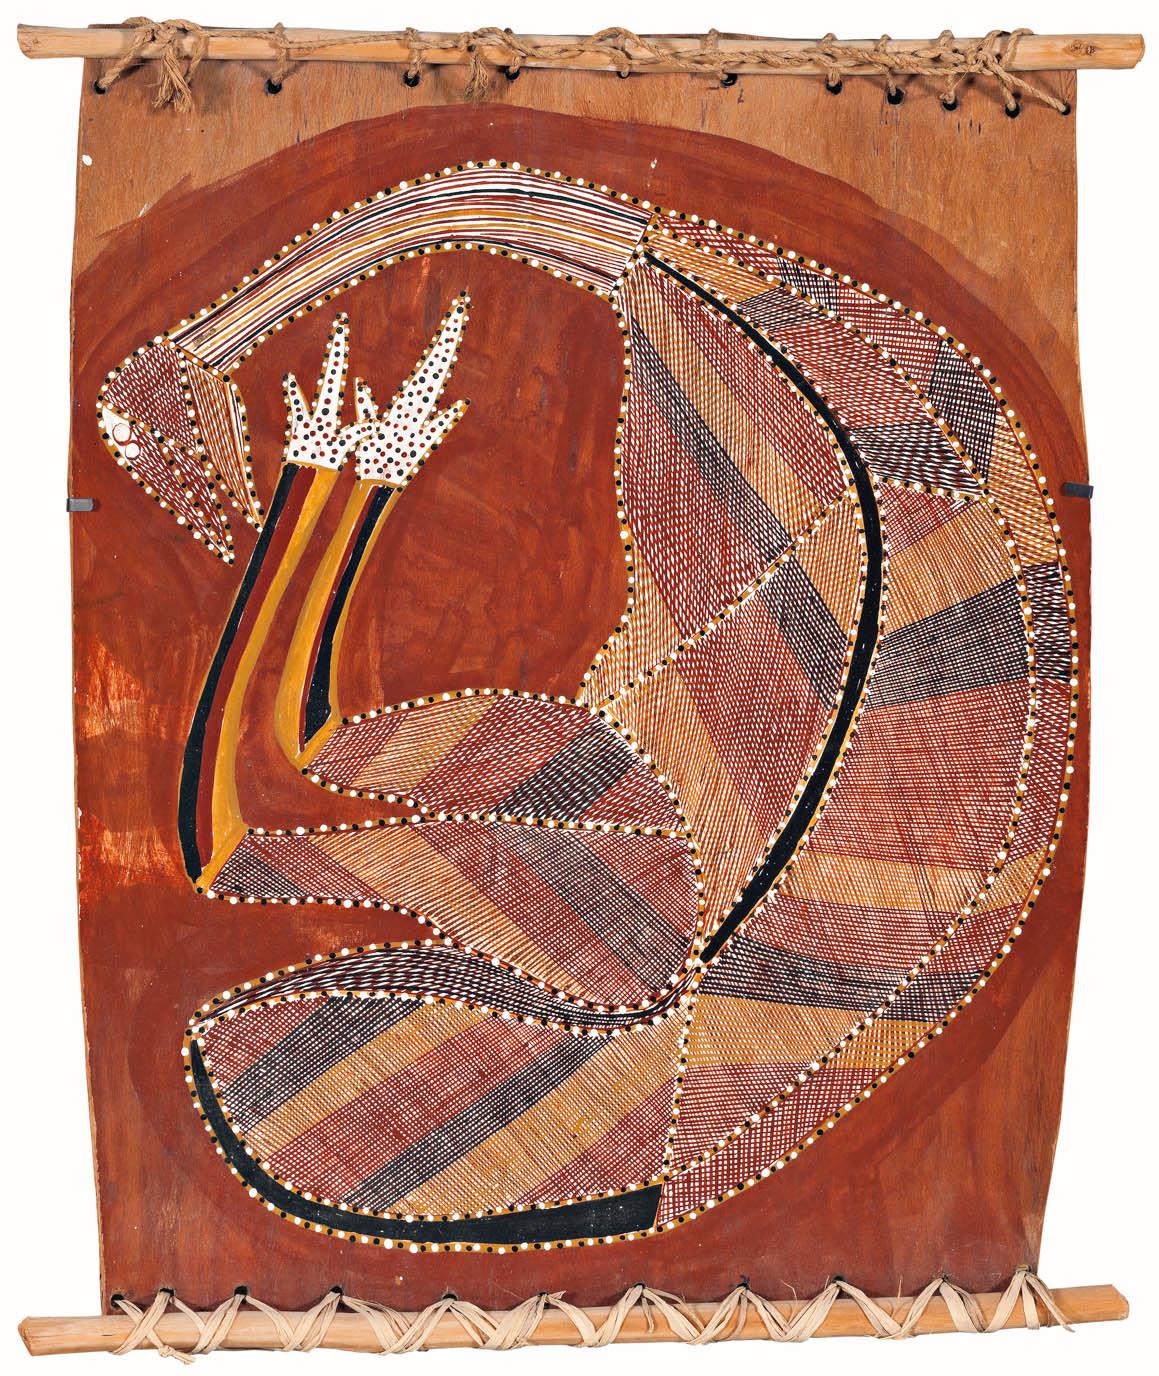 PHOTO ABOVE: Year - 1980 | Medium - earth pigments on Stringybark (Eucalyptus tetrodonta) | Dimensions - 47 x 38 x 5cm | Credit - Private collection, Melbourne | Copyright - © John Mawurndjul/Copyright Agency, 2019